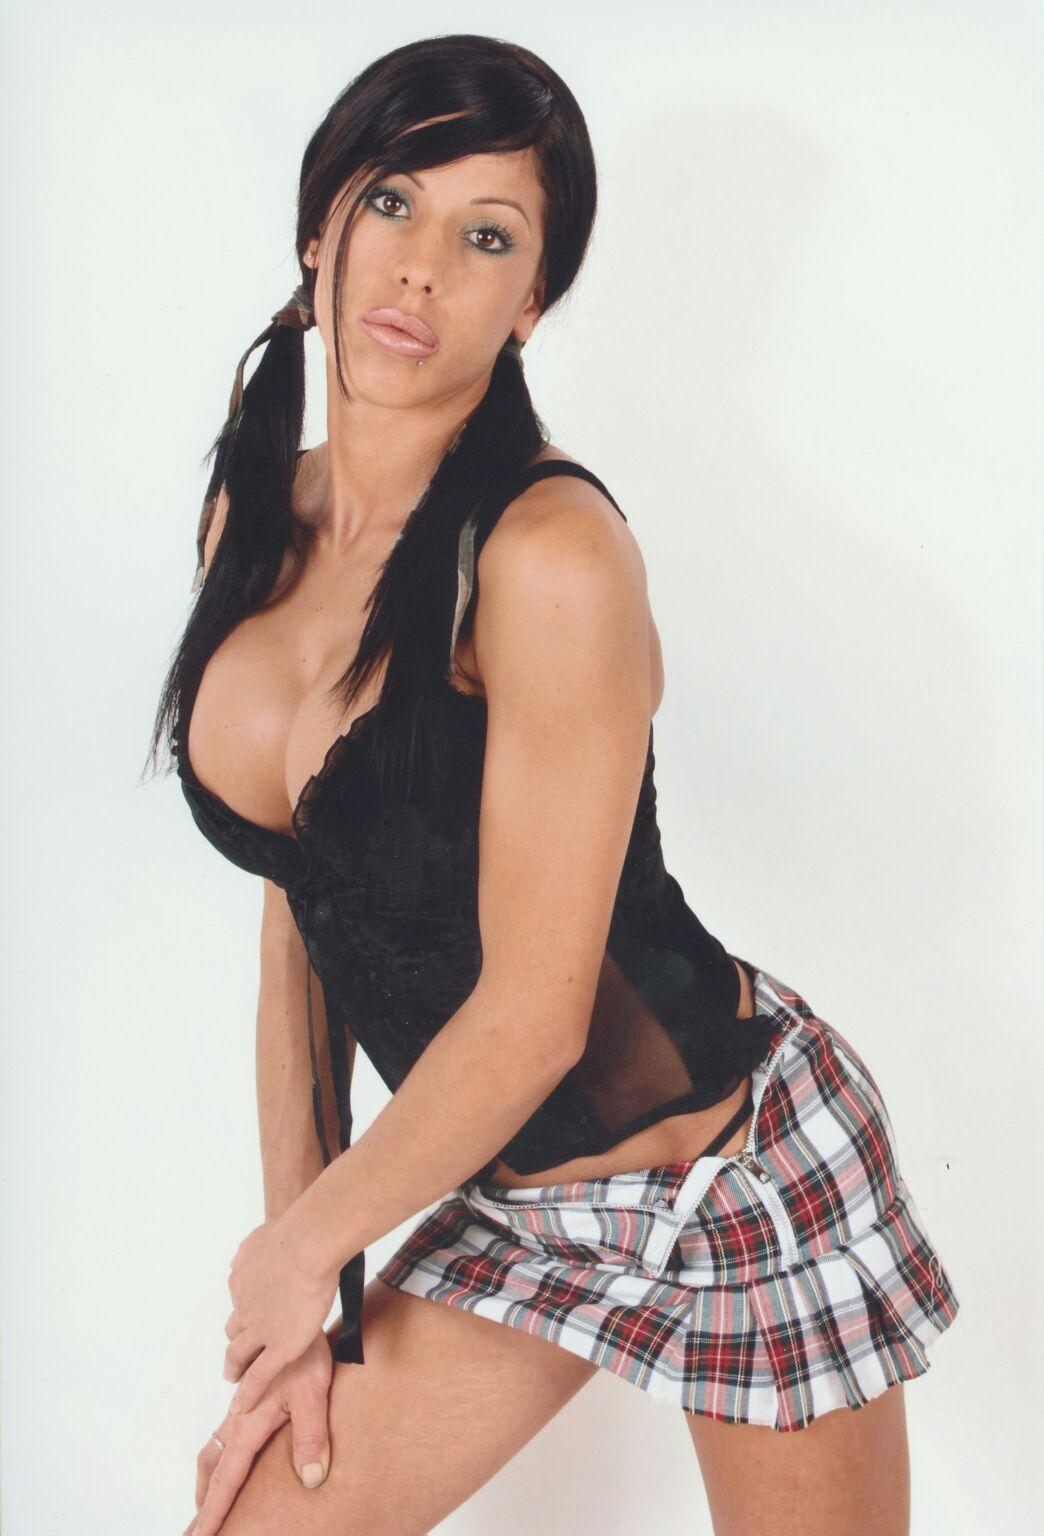 Marta Strippers Valencia